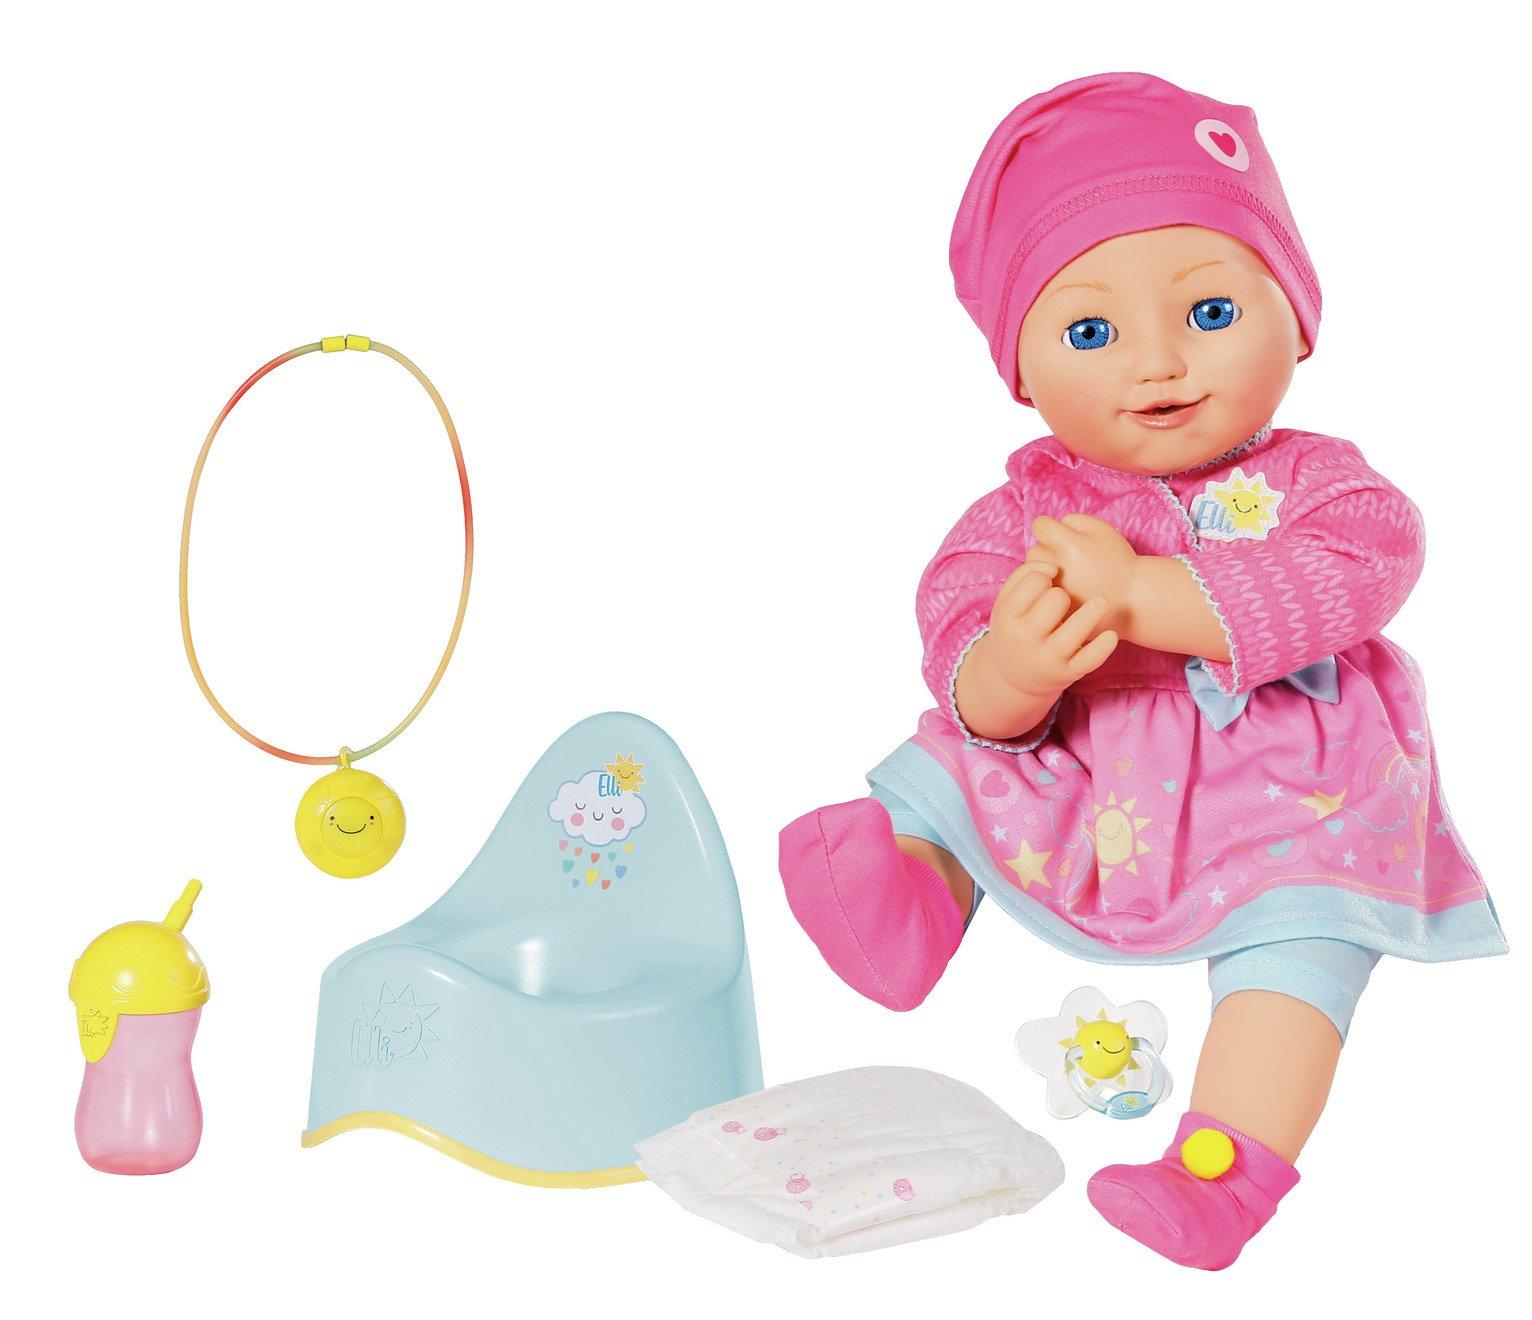 Elli Smiles Doll